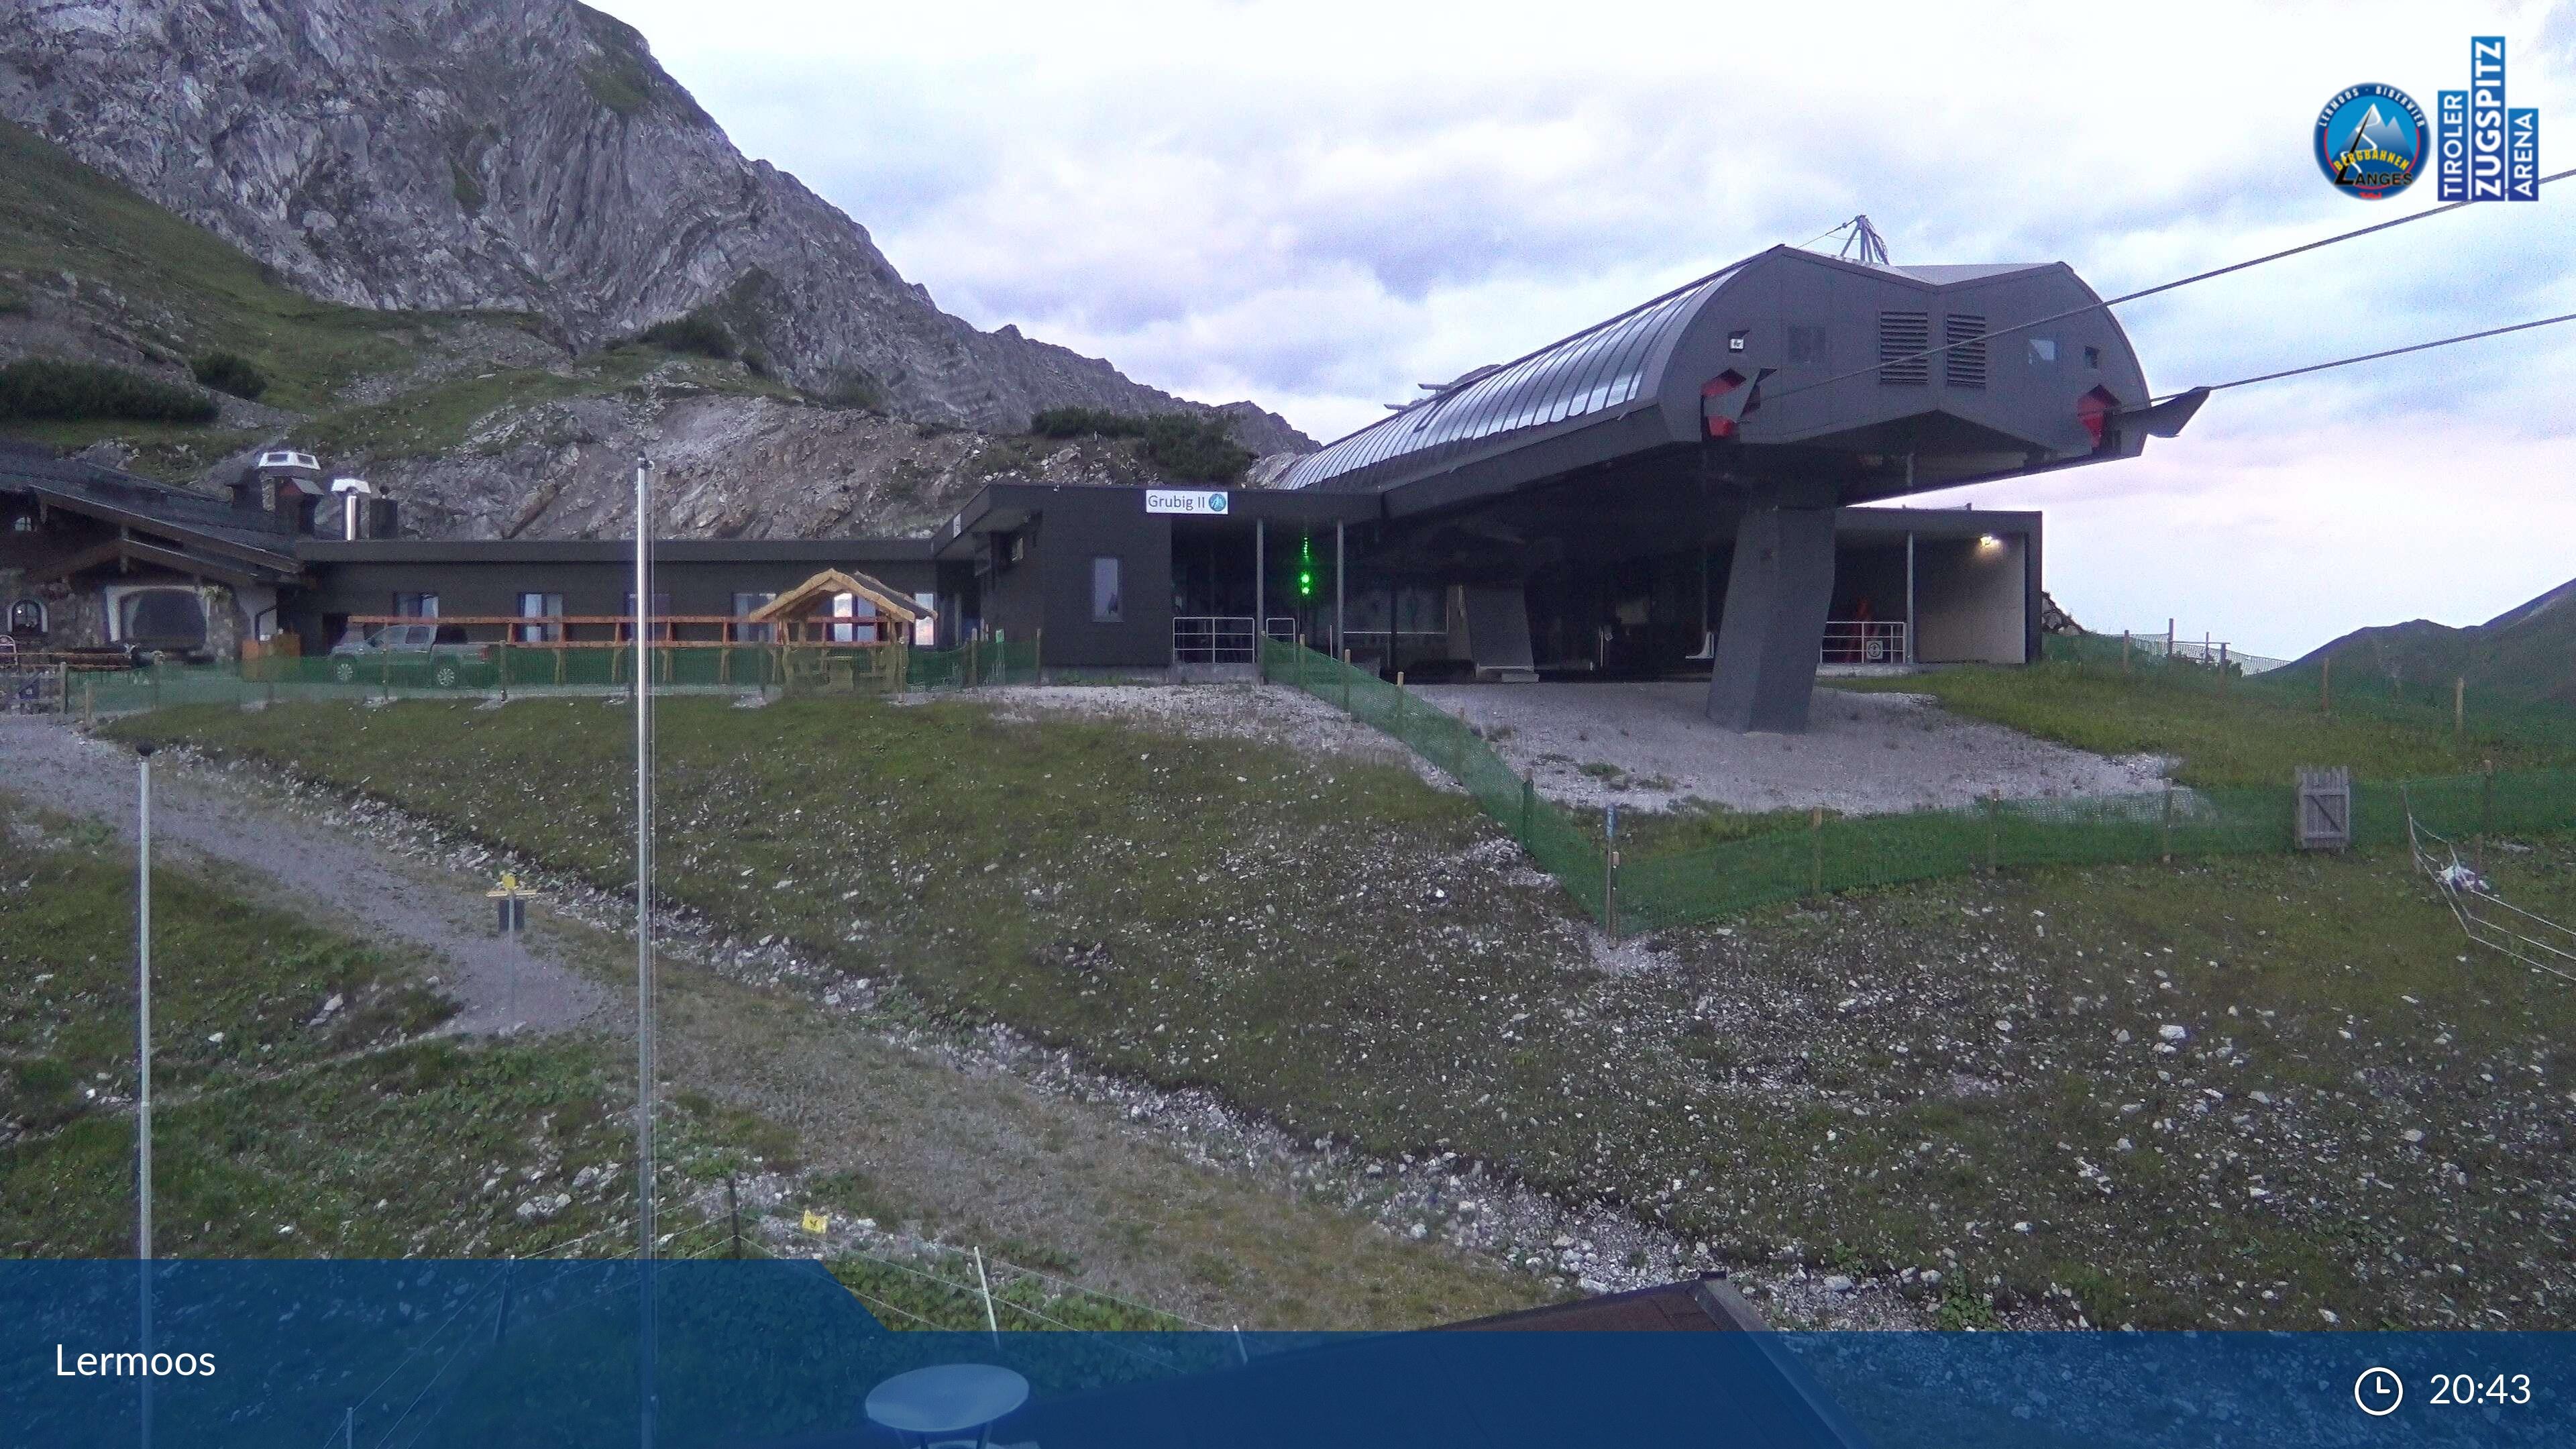 Lermoos webcam - Grubigstein ski station 2.015 m